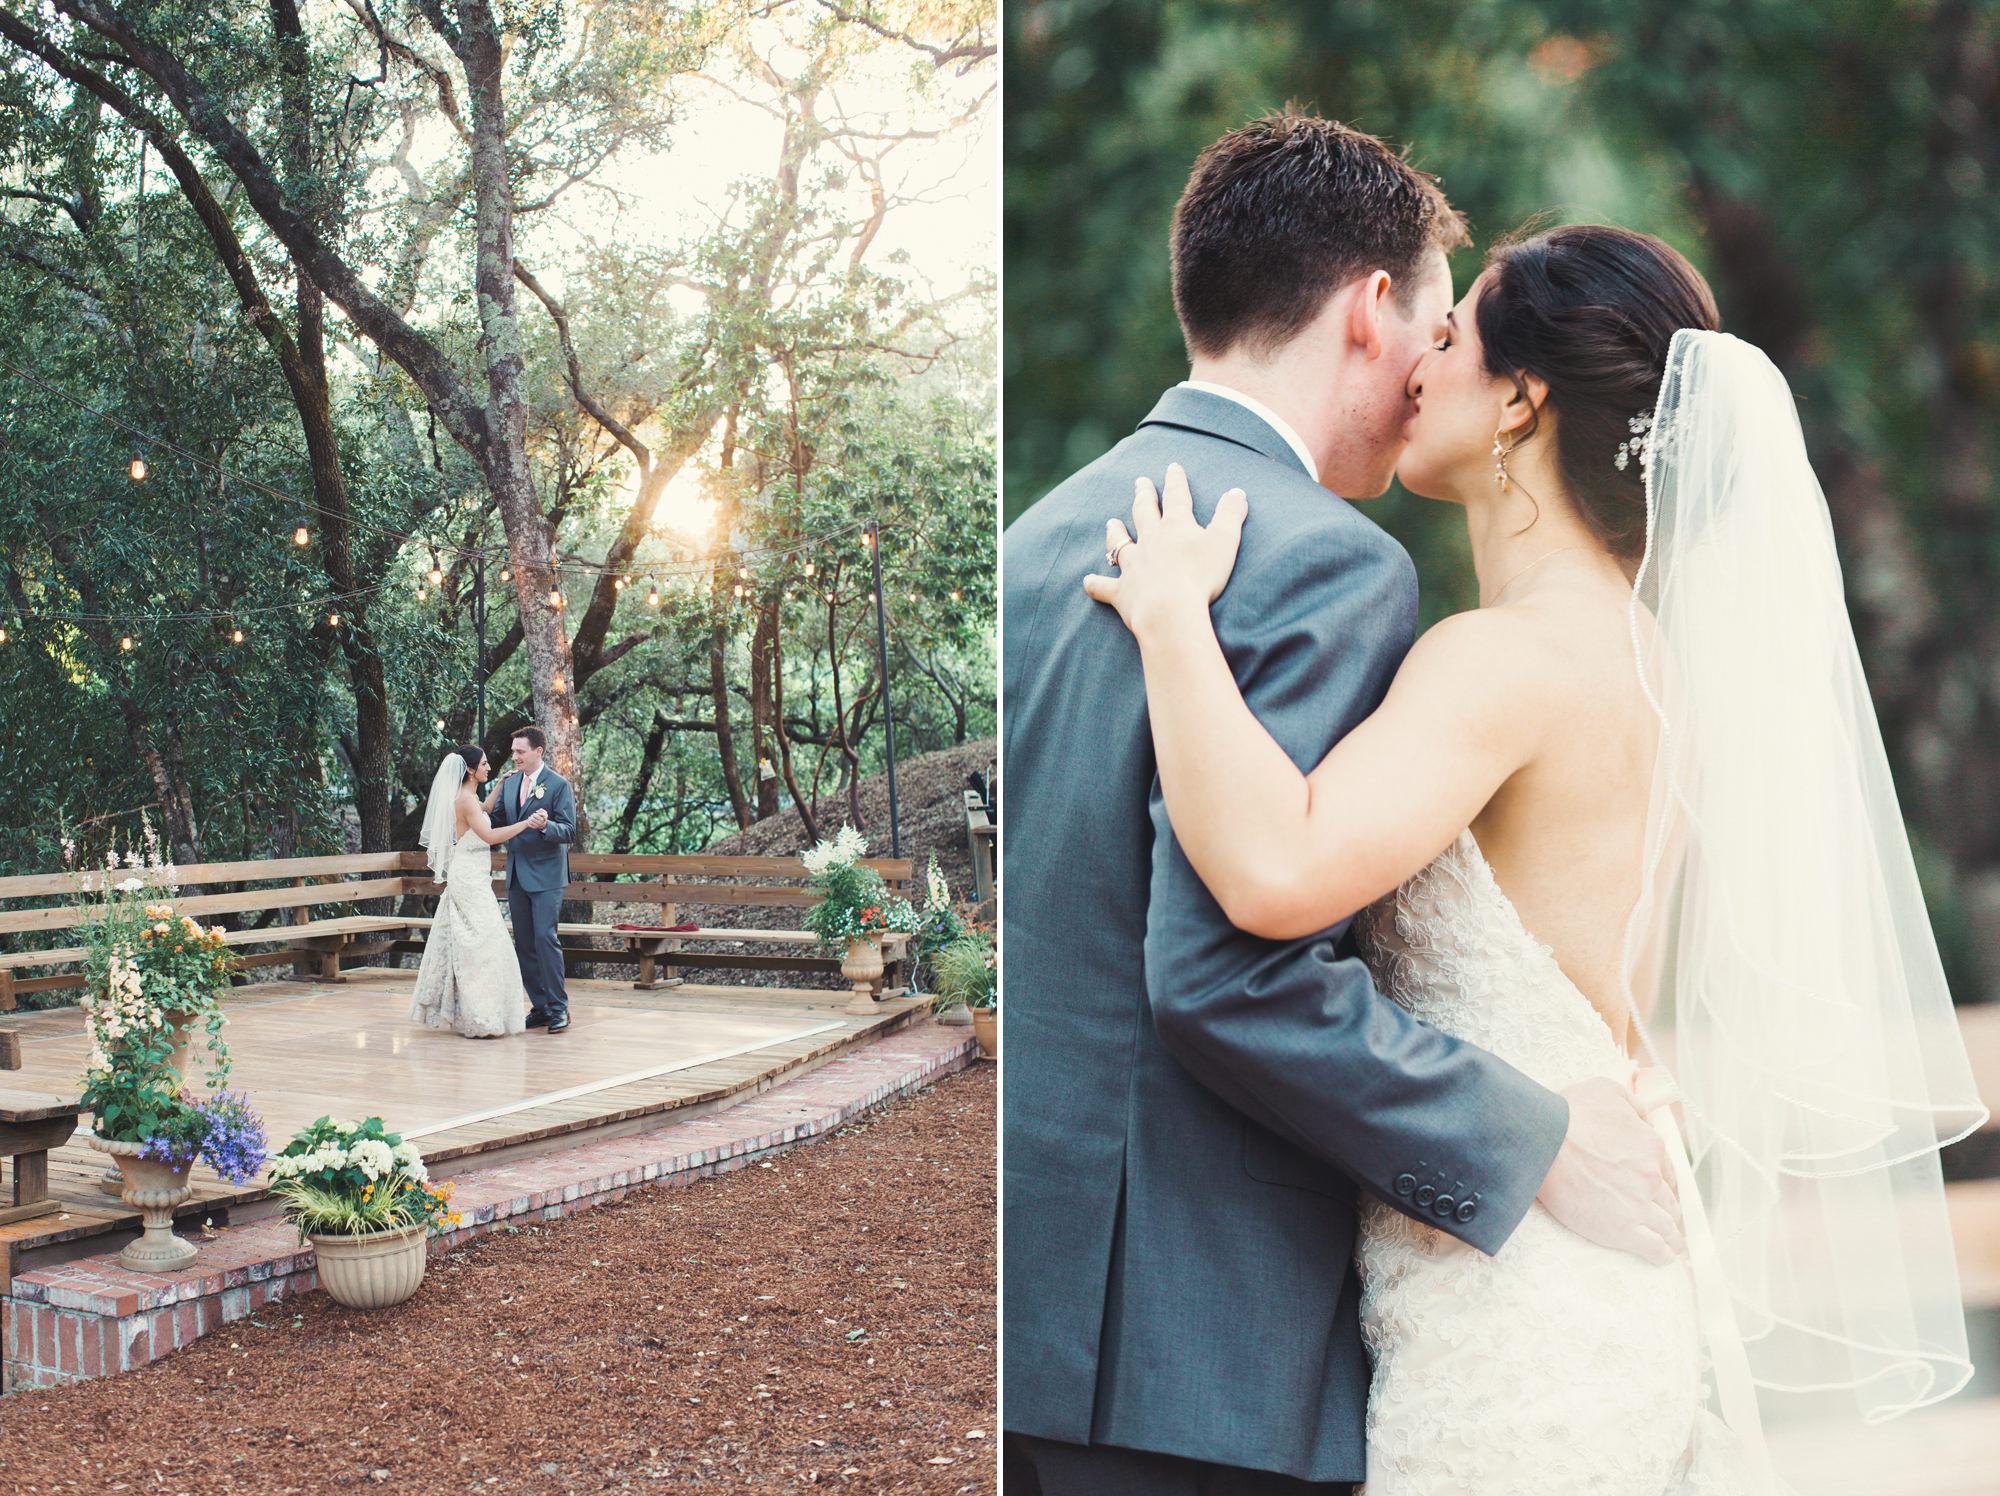 Backyard Wedding in California©Anne-Claire Brun 0035